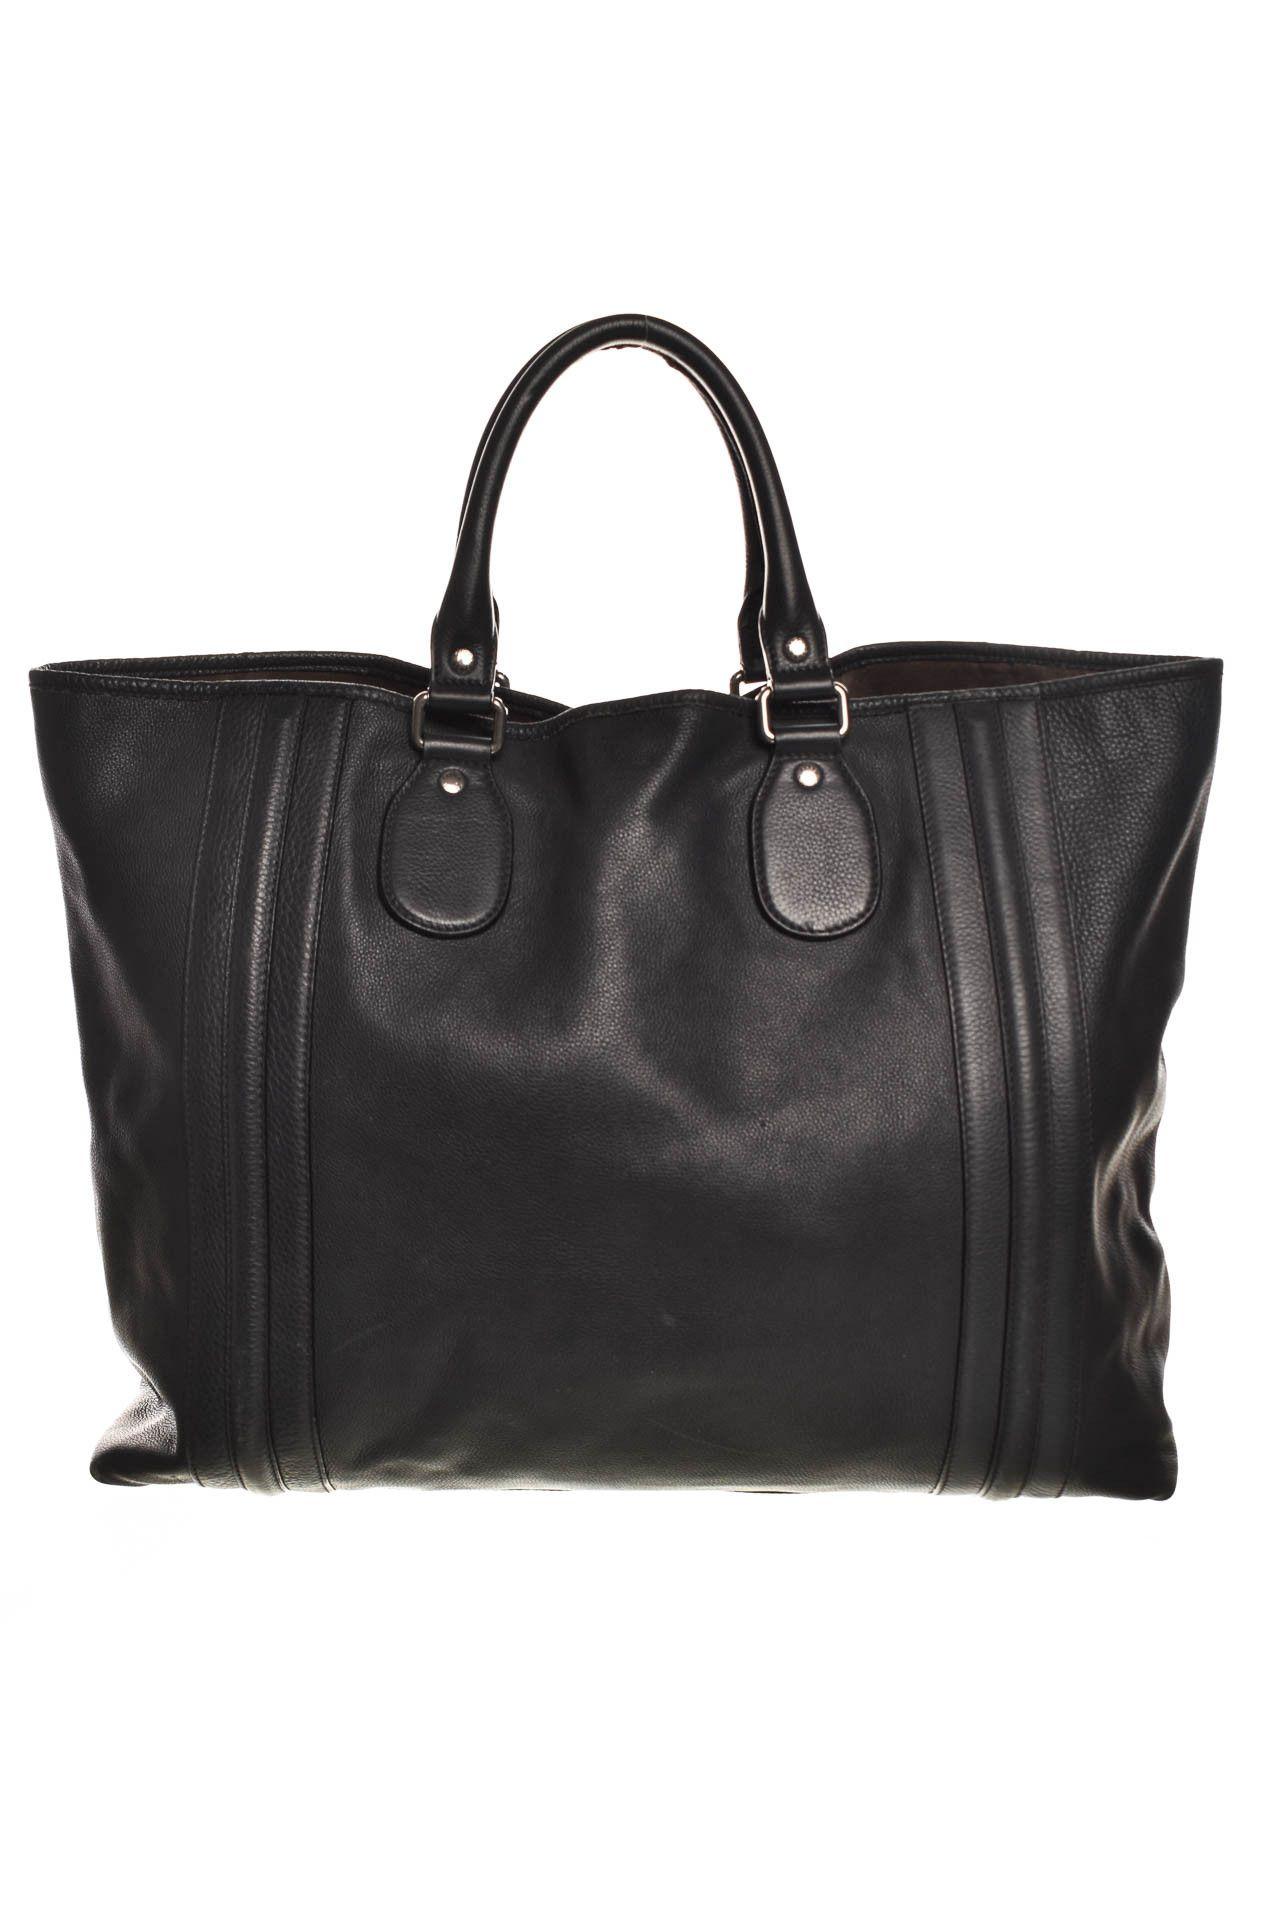 Gucci - Hand Bag Grafite - Foto 4